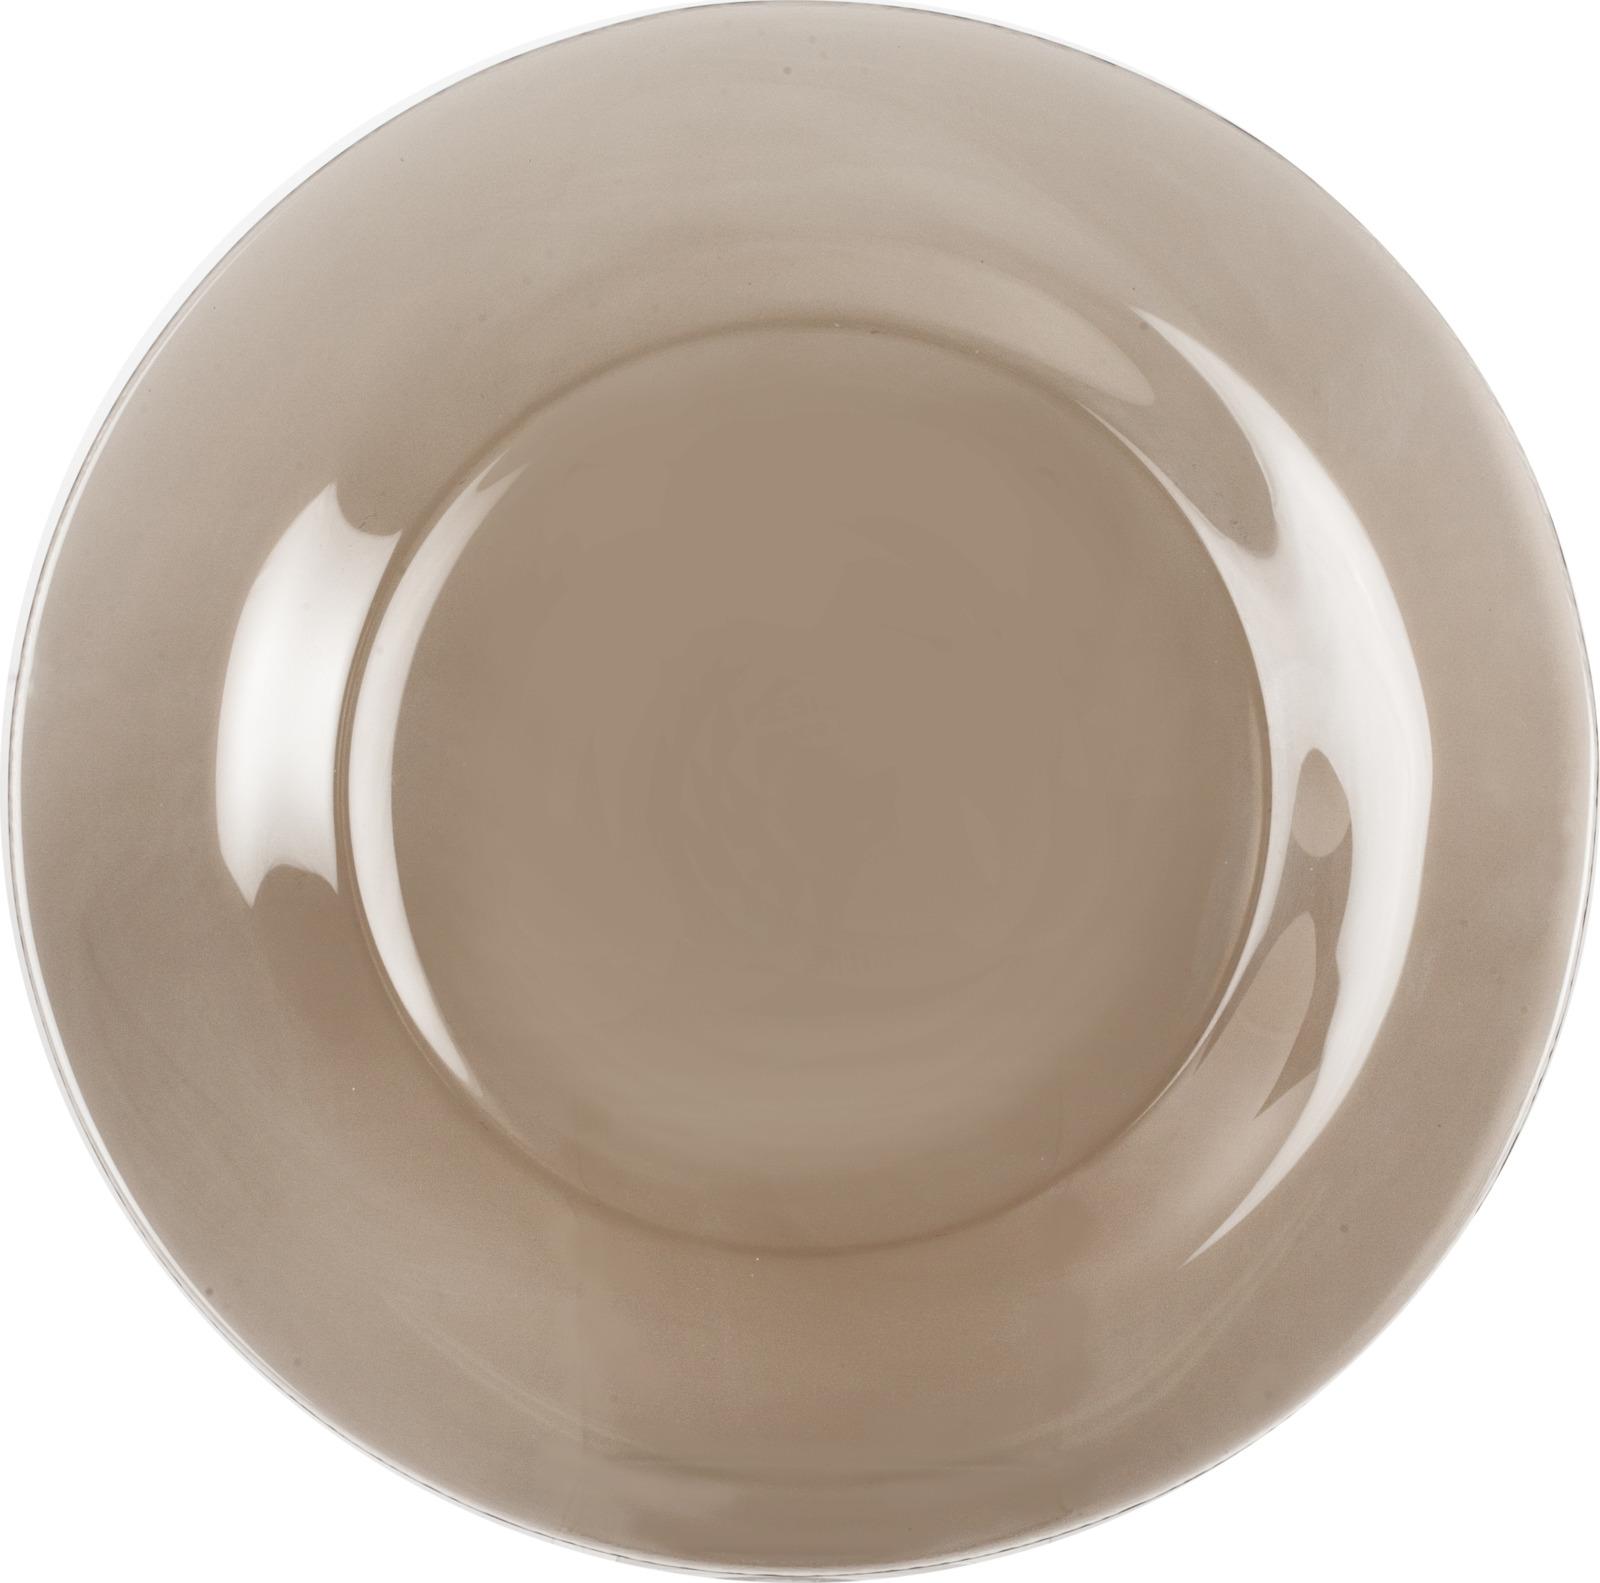 Тарелка Luminarc Амбьянте Эклипс, L5086, диаметр 25 смL5086